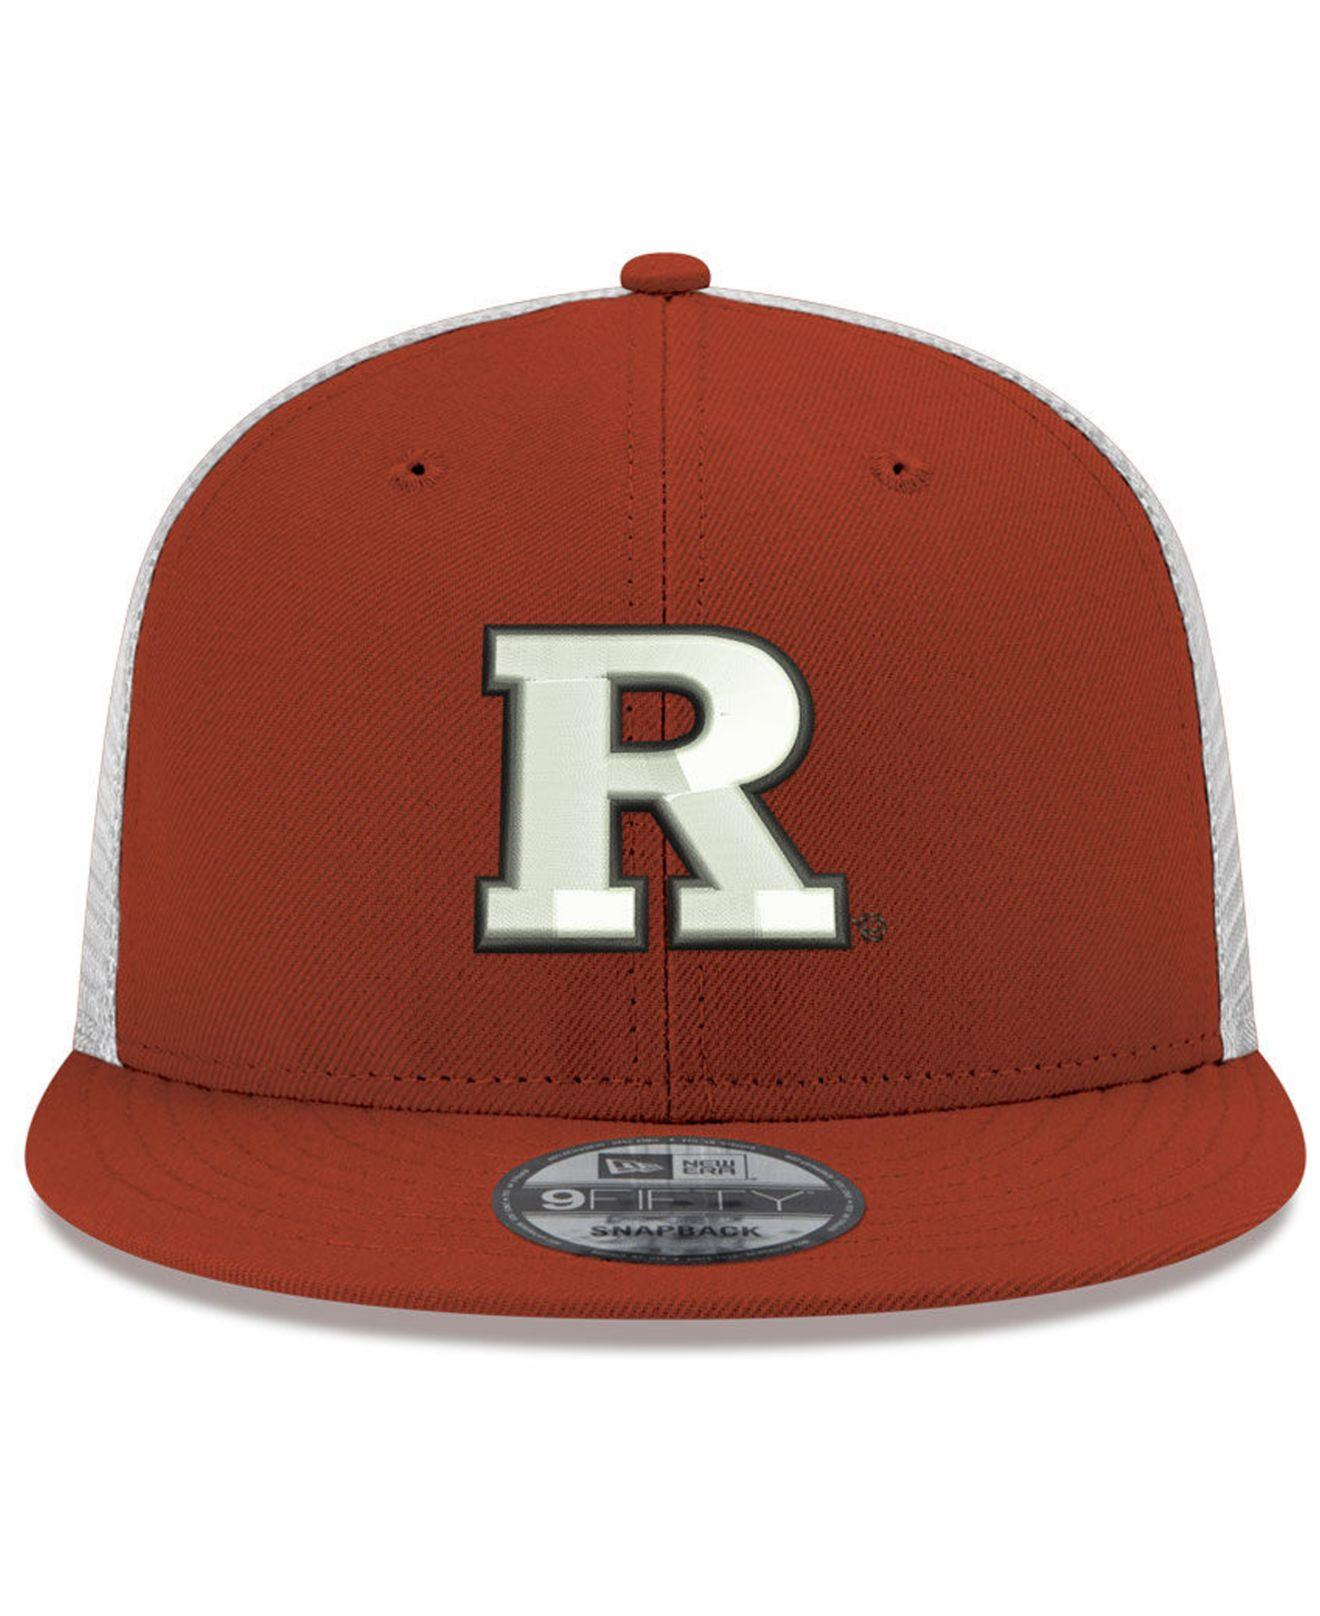 best service 8fe55 9dab2 KTZ. Men s Red Rutgers Scarlet Knights Tc Meshback Snapback Cap